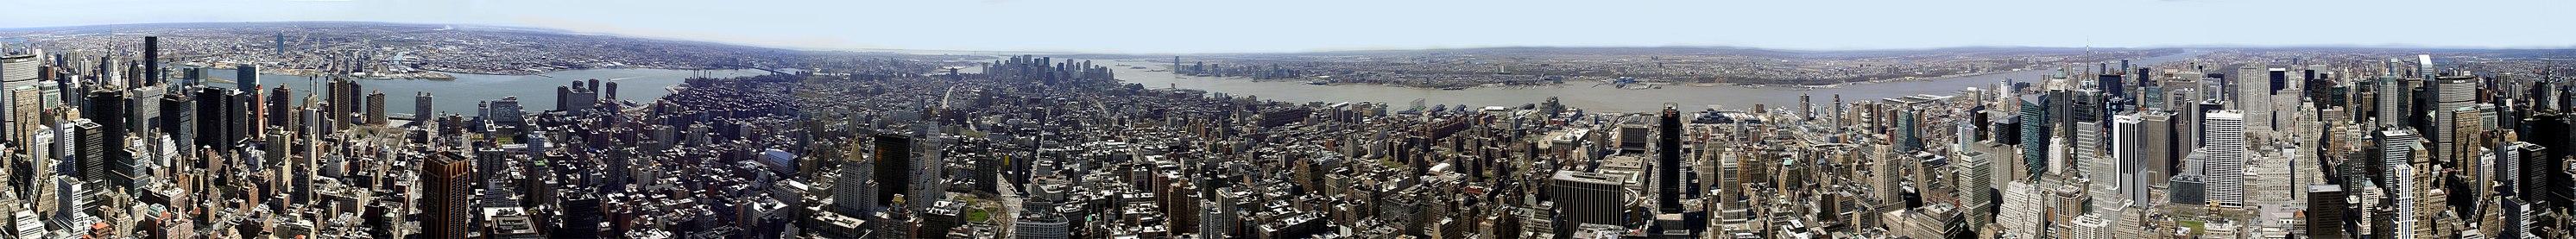 Панорамный снимок 360° Нью-Йорка со здания Эмпайр-стейт-билдинг весной 2005 года